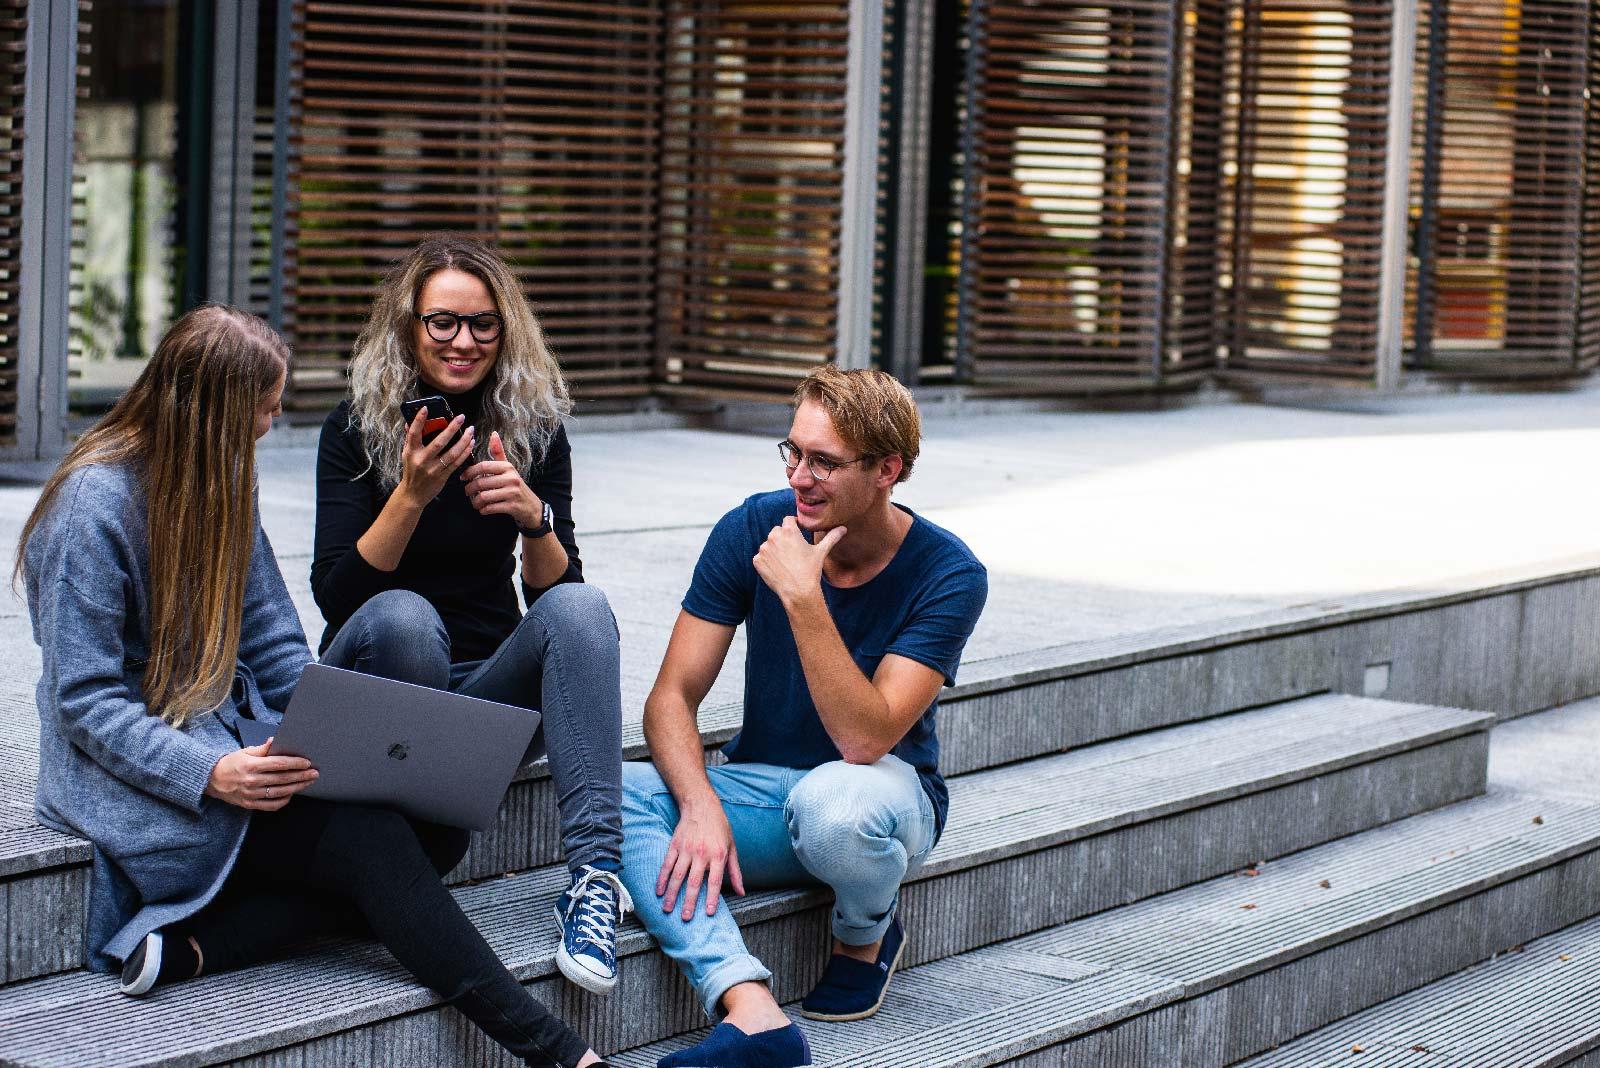 Estudiantes Extranjeros en España